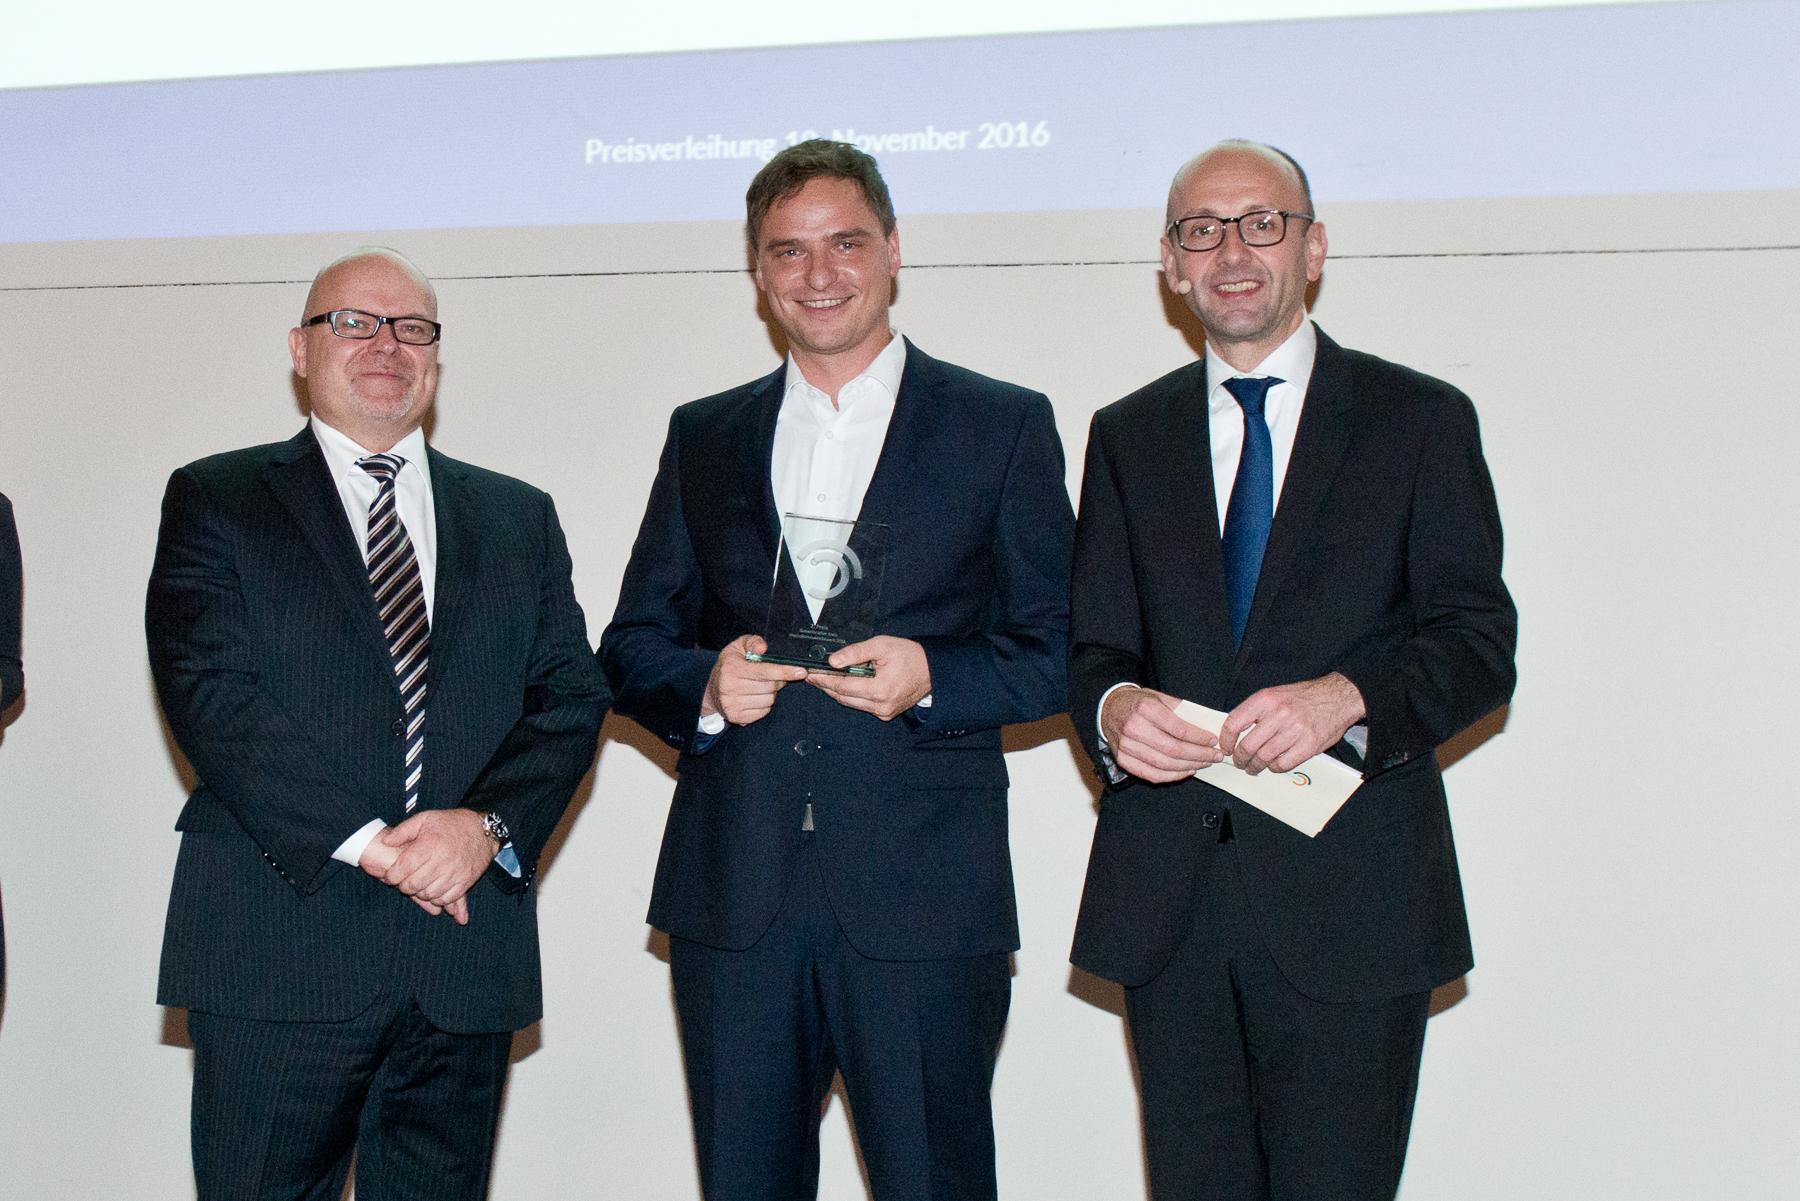 Dr Michael Jaffé, Adrian Hoffmann (2nd prize), Prof. Lucas F. Flöther